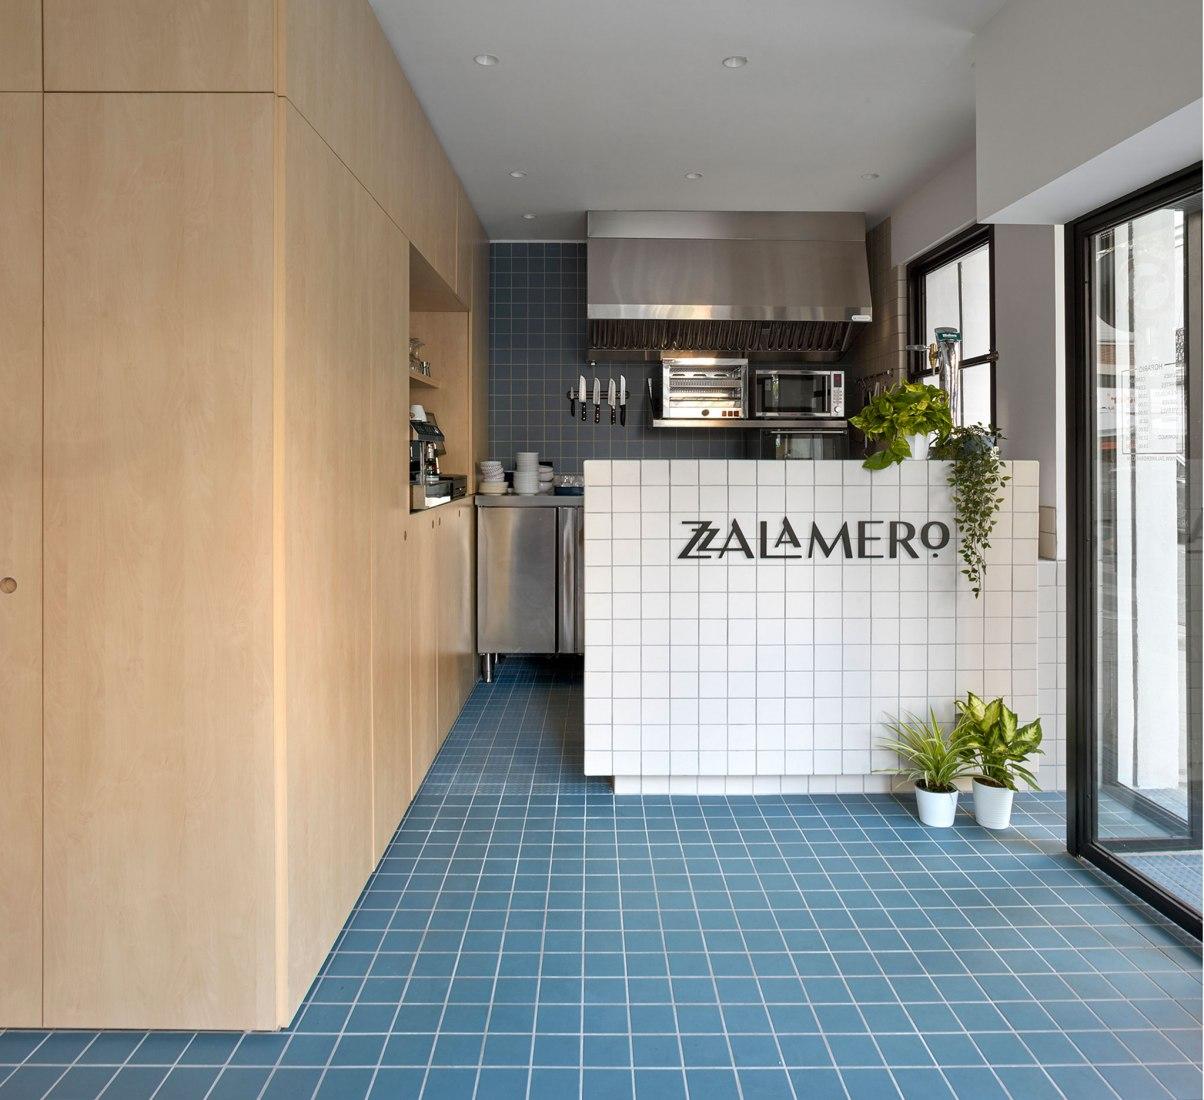 Zalamero Ruzafa Bar por DG estudio. Fotografía por Mariela Apollonio